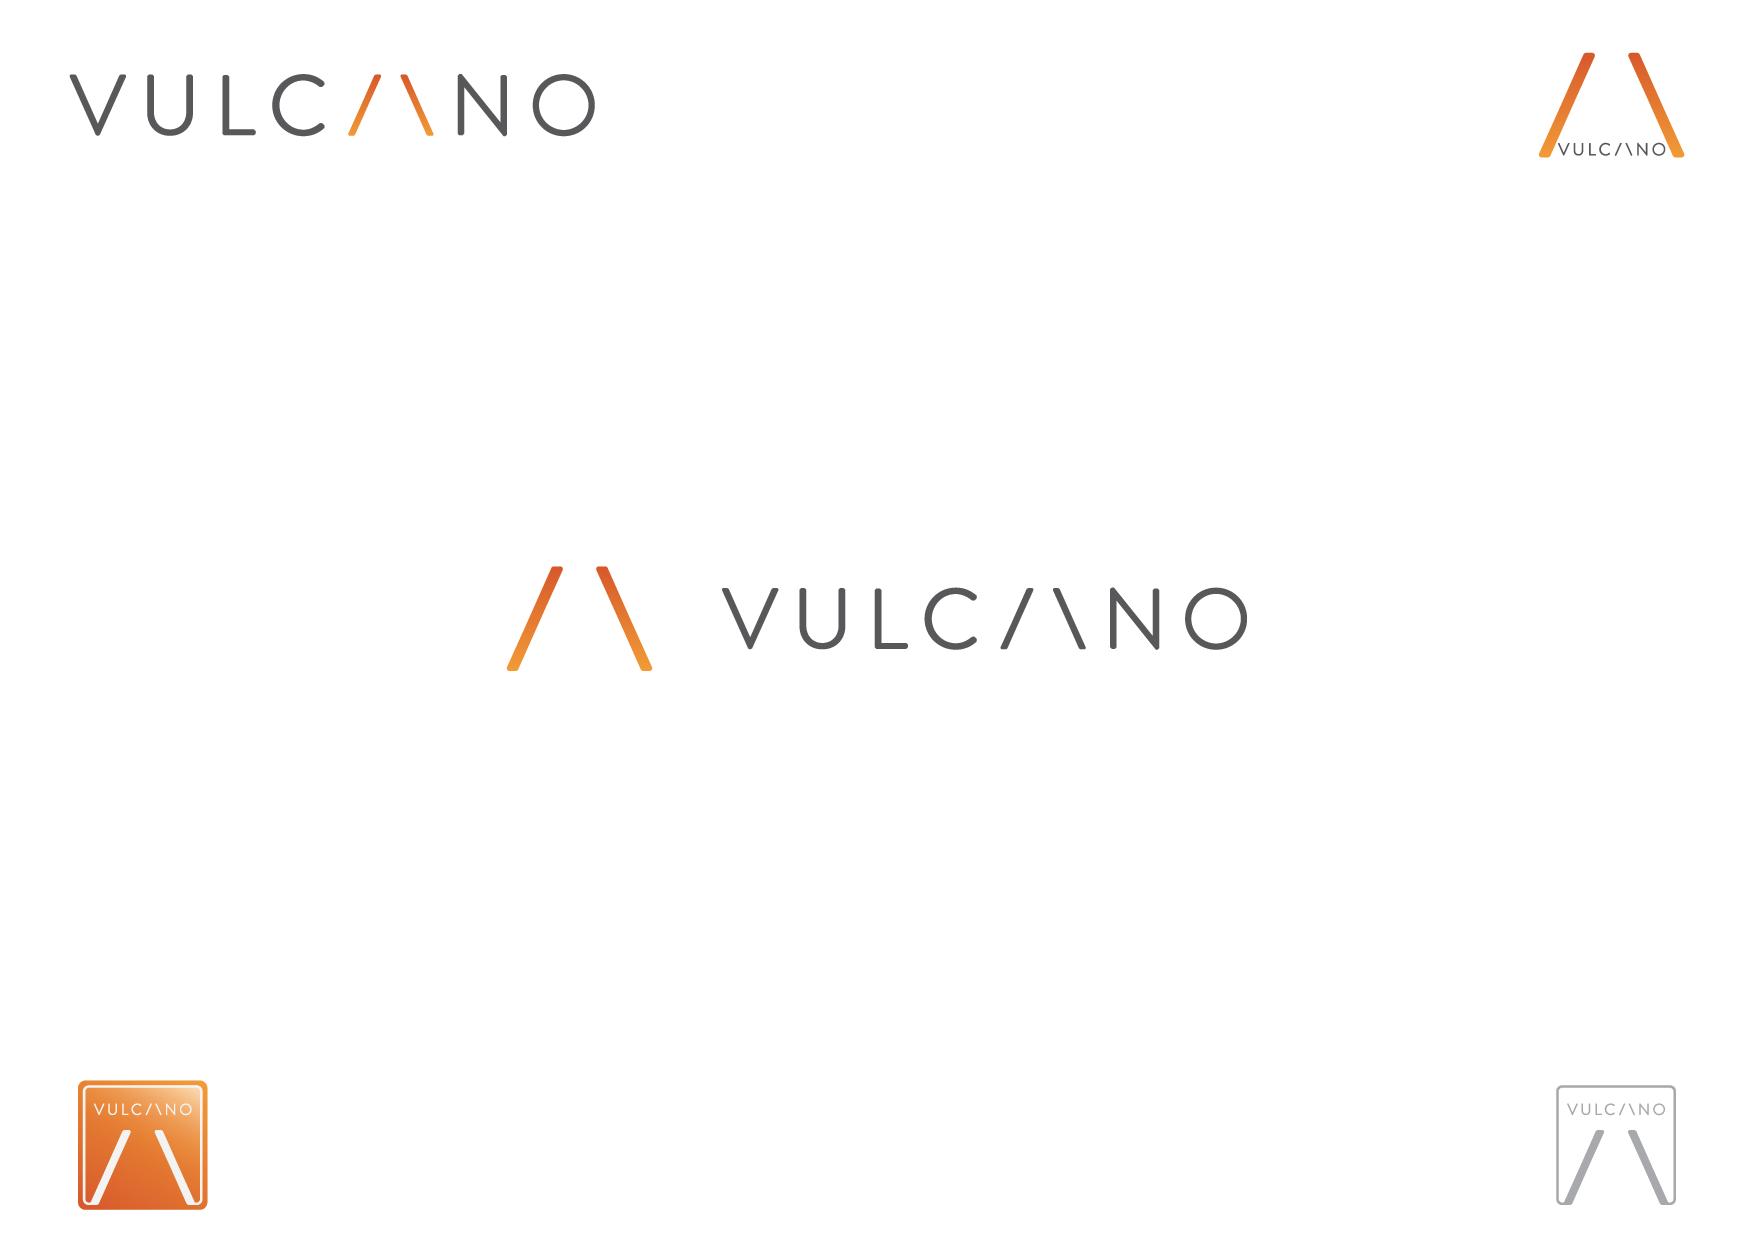 Help Vulcano with a new logo